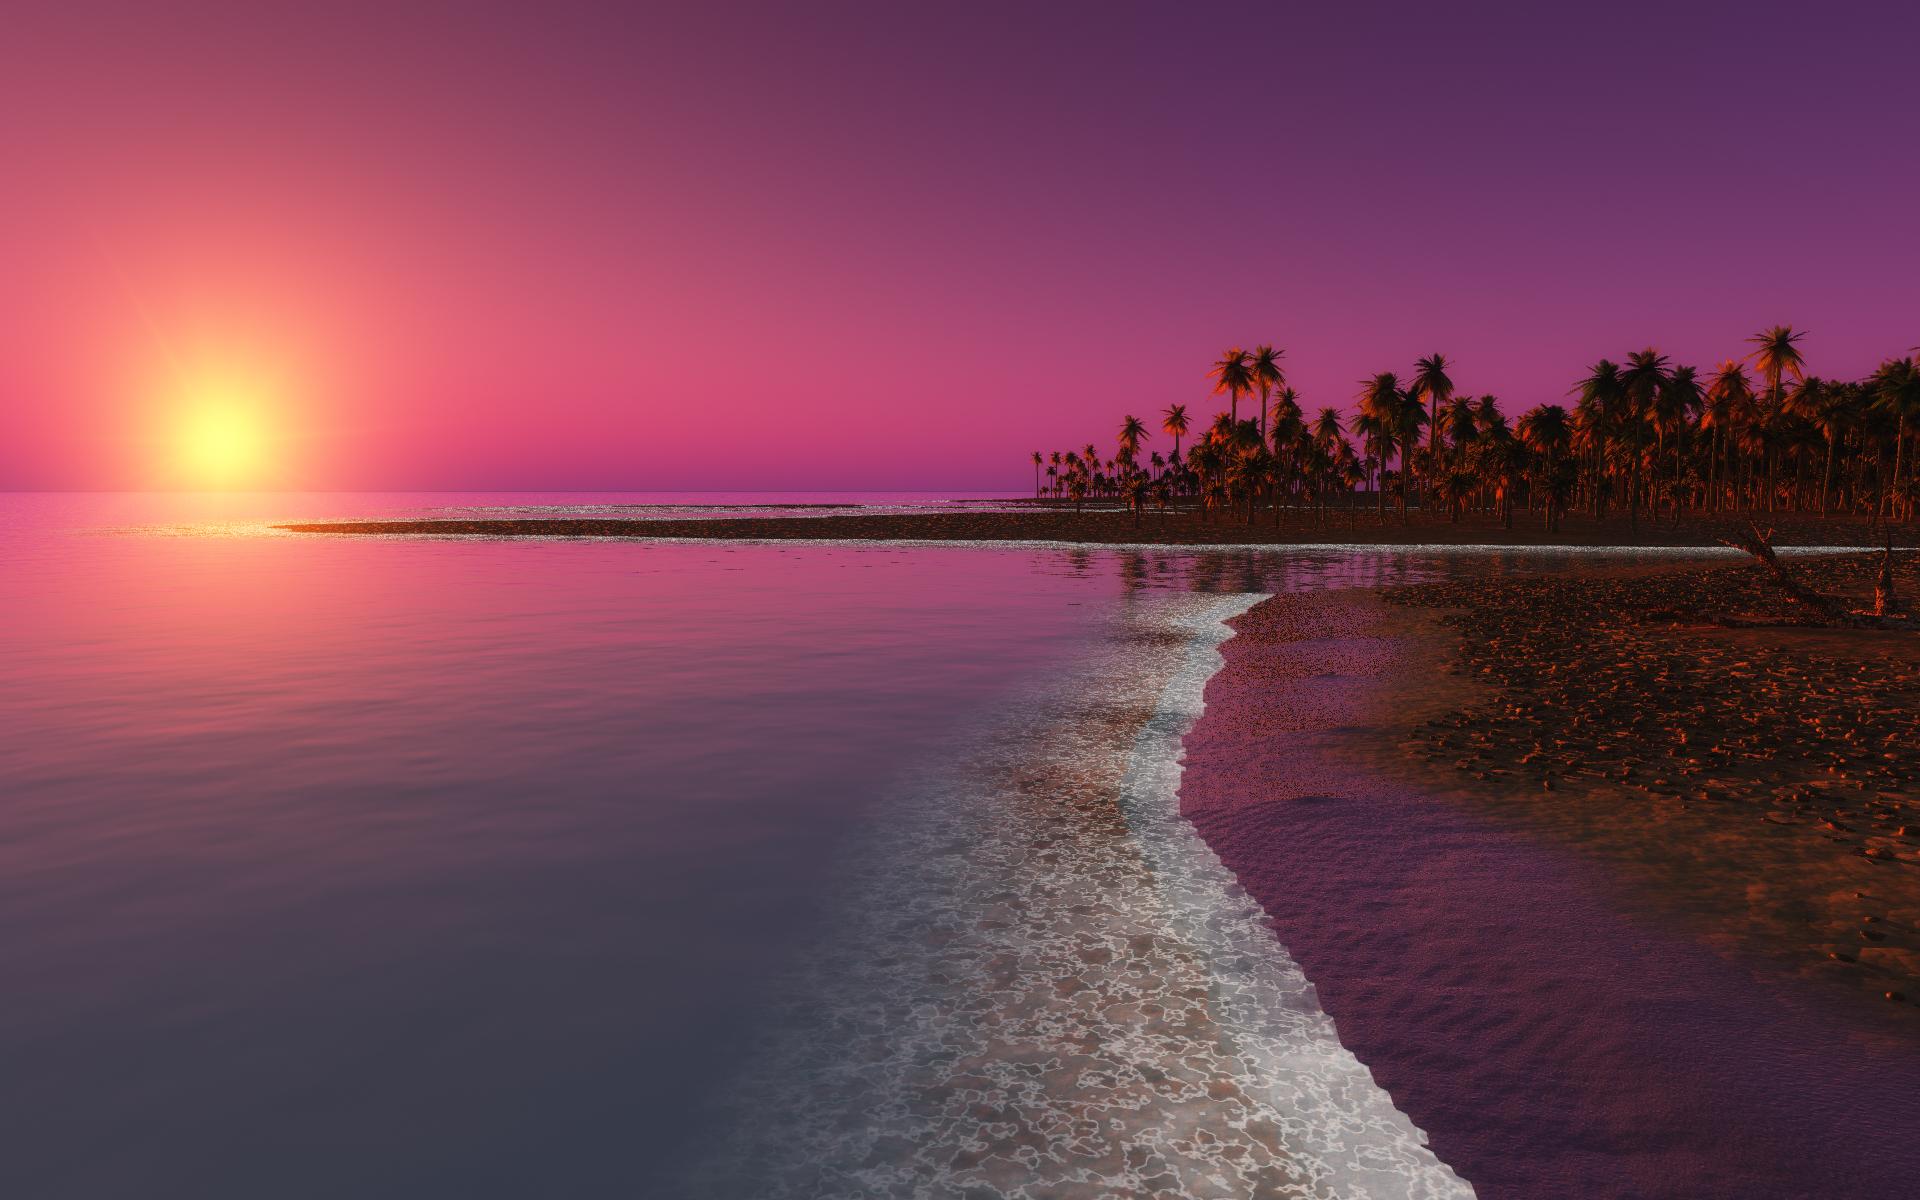 Twilight Sunset 4156323 1920x1200 All For Desktop 1920x1200